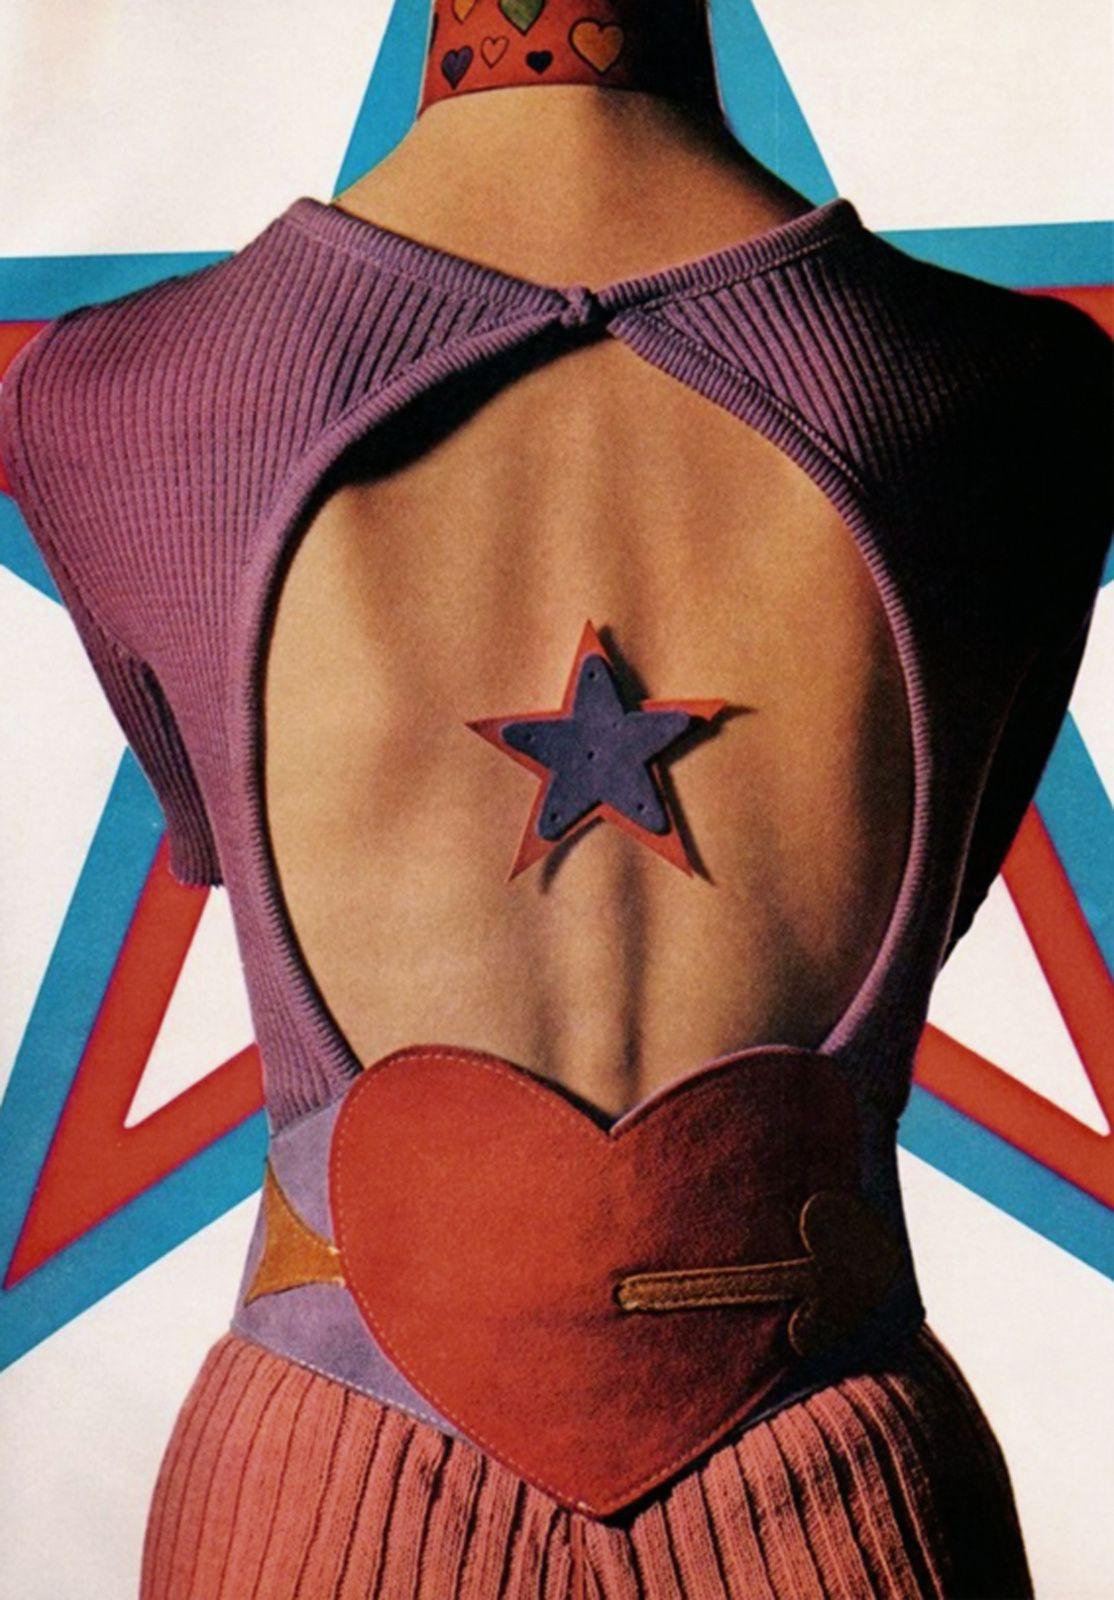 """ Harper's Bazaar-"", 1971 de Willy RIZZO - Courtesy de l'artiste"